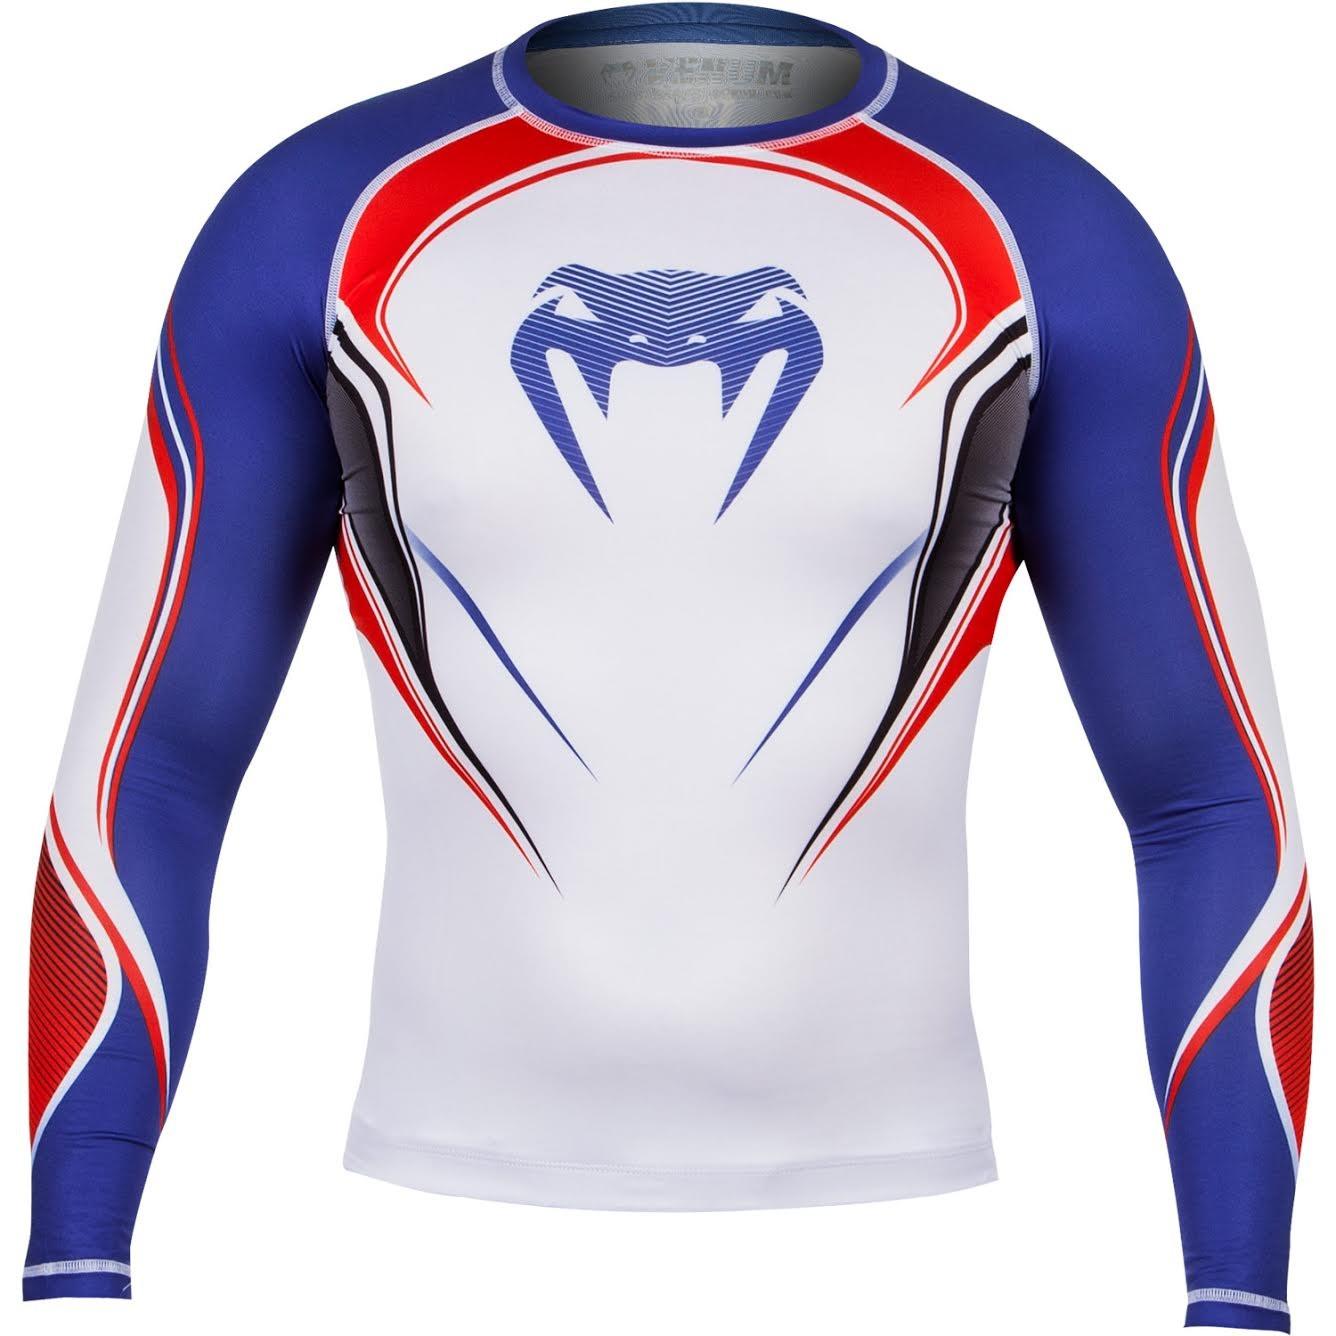 Компрессионная футболка Venum UK Hero Compression T-Shirt - Ice/Blue/Red - Long Sleeves<br>Вес кг: 0.00000000;